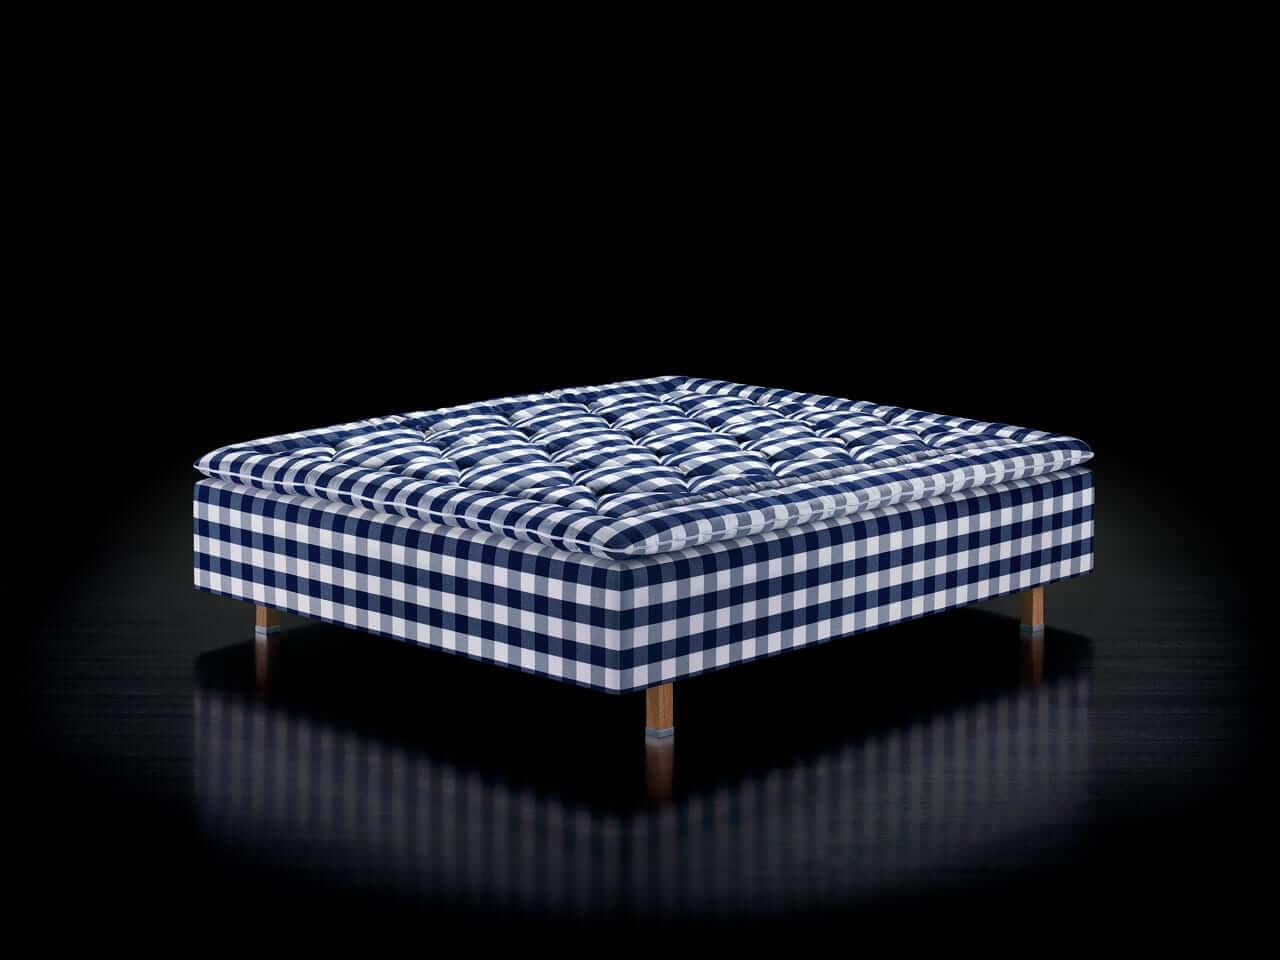 beds hastens superia superia v3 lowres 1 Superia